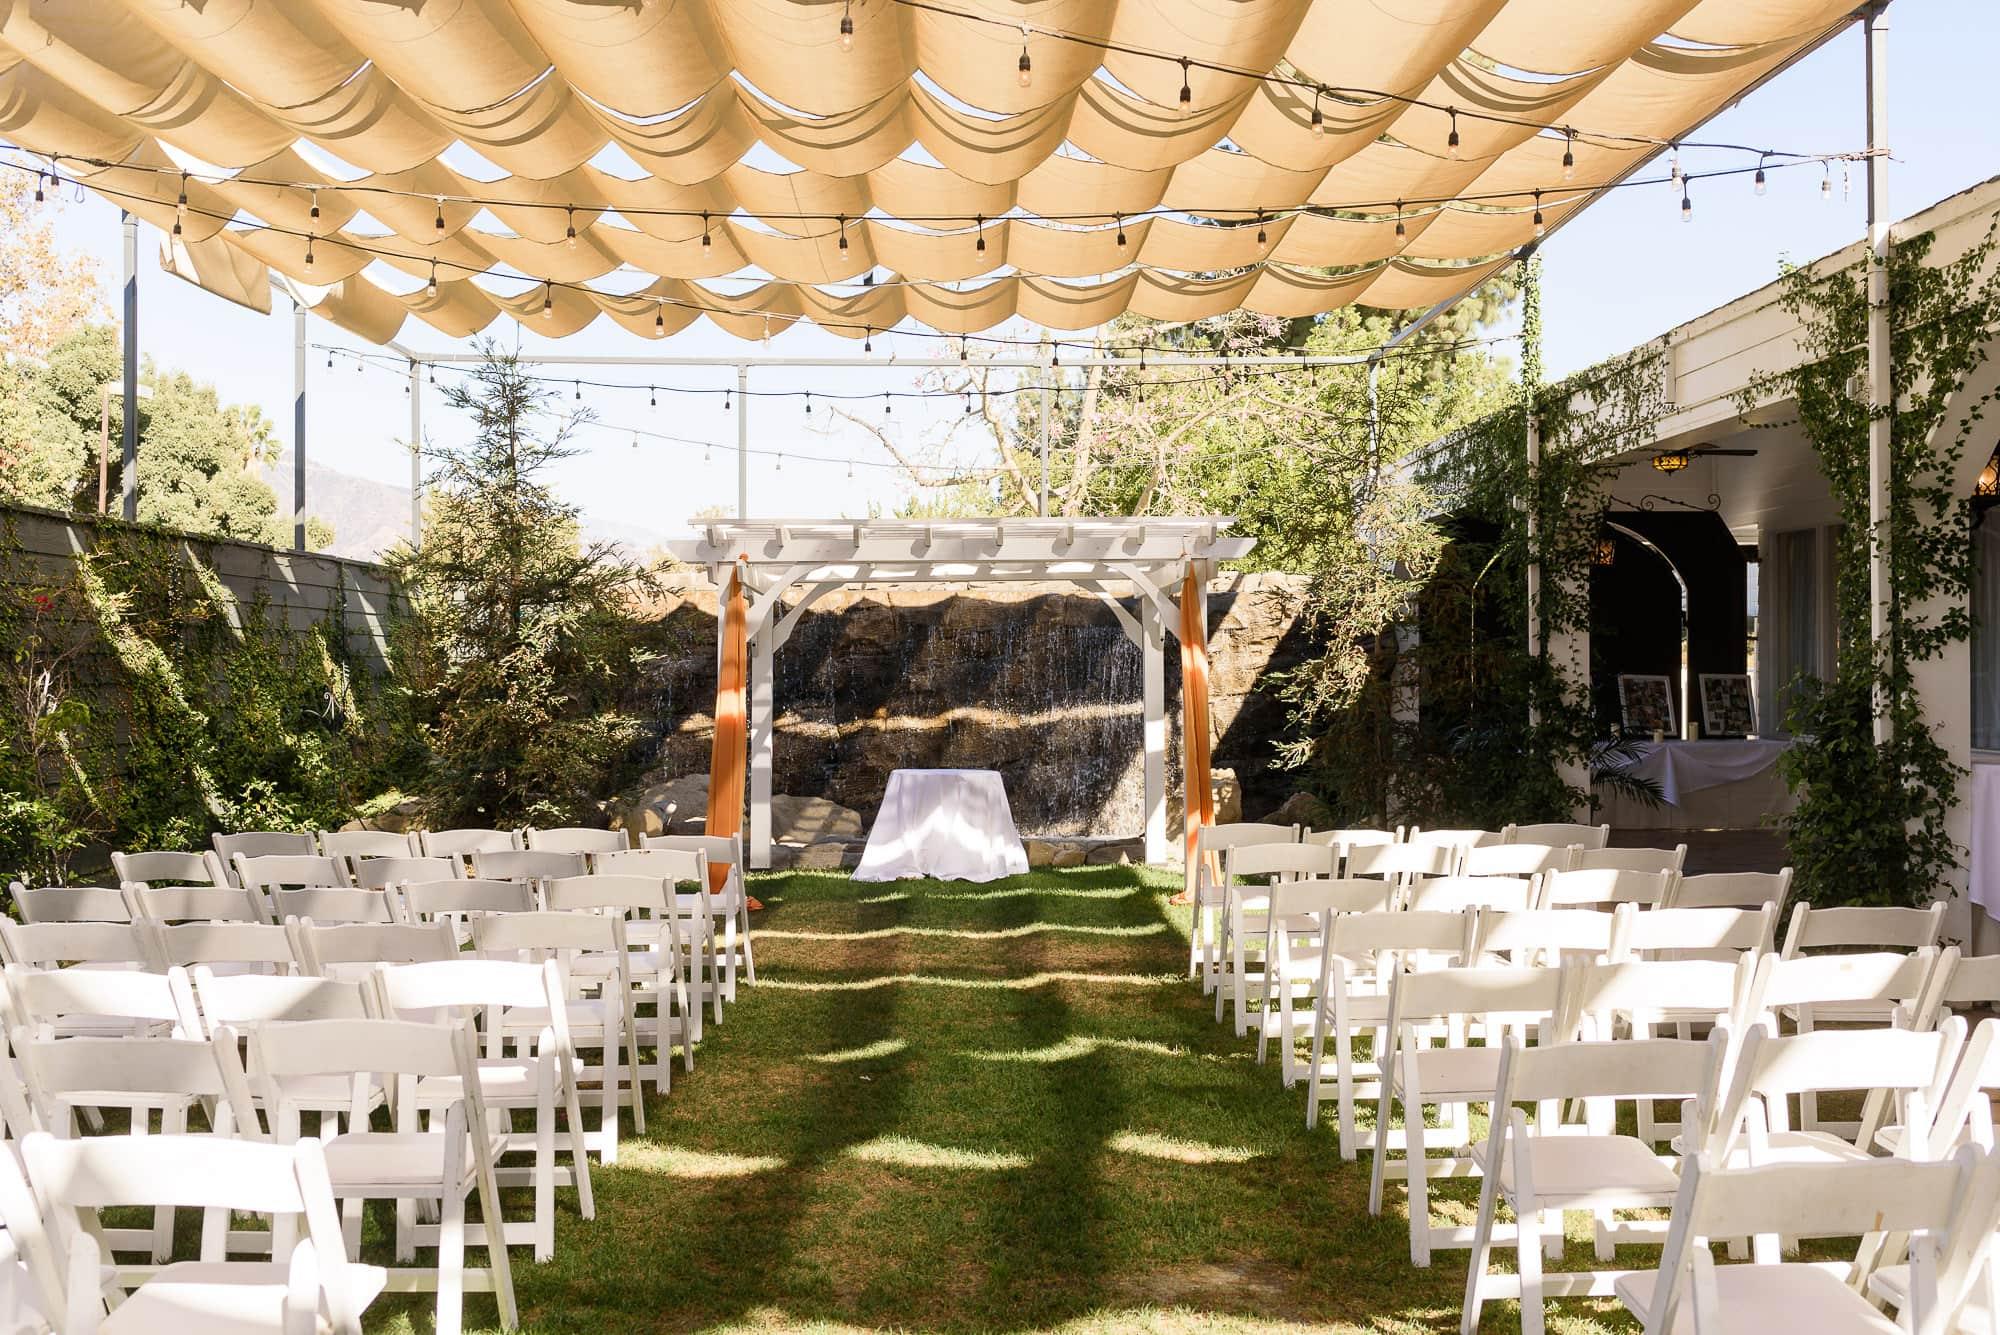 011_Alan_and_Heidi_Los_Angeles_Equestrian_Center_Wedding